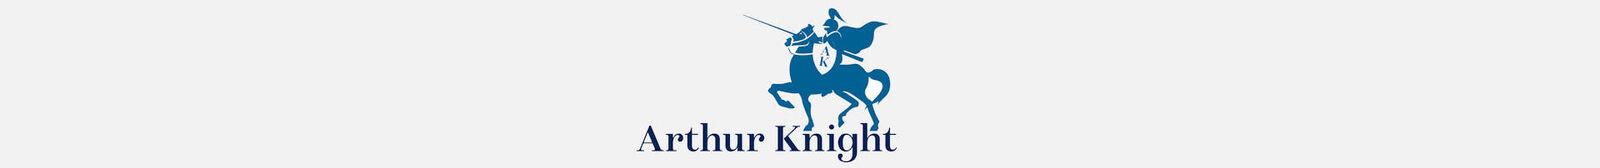 Gold Metallic Metallic Metallic Leather Arthur Knight damen Driving schuhe 248073